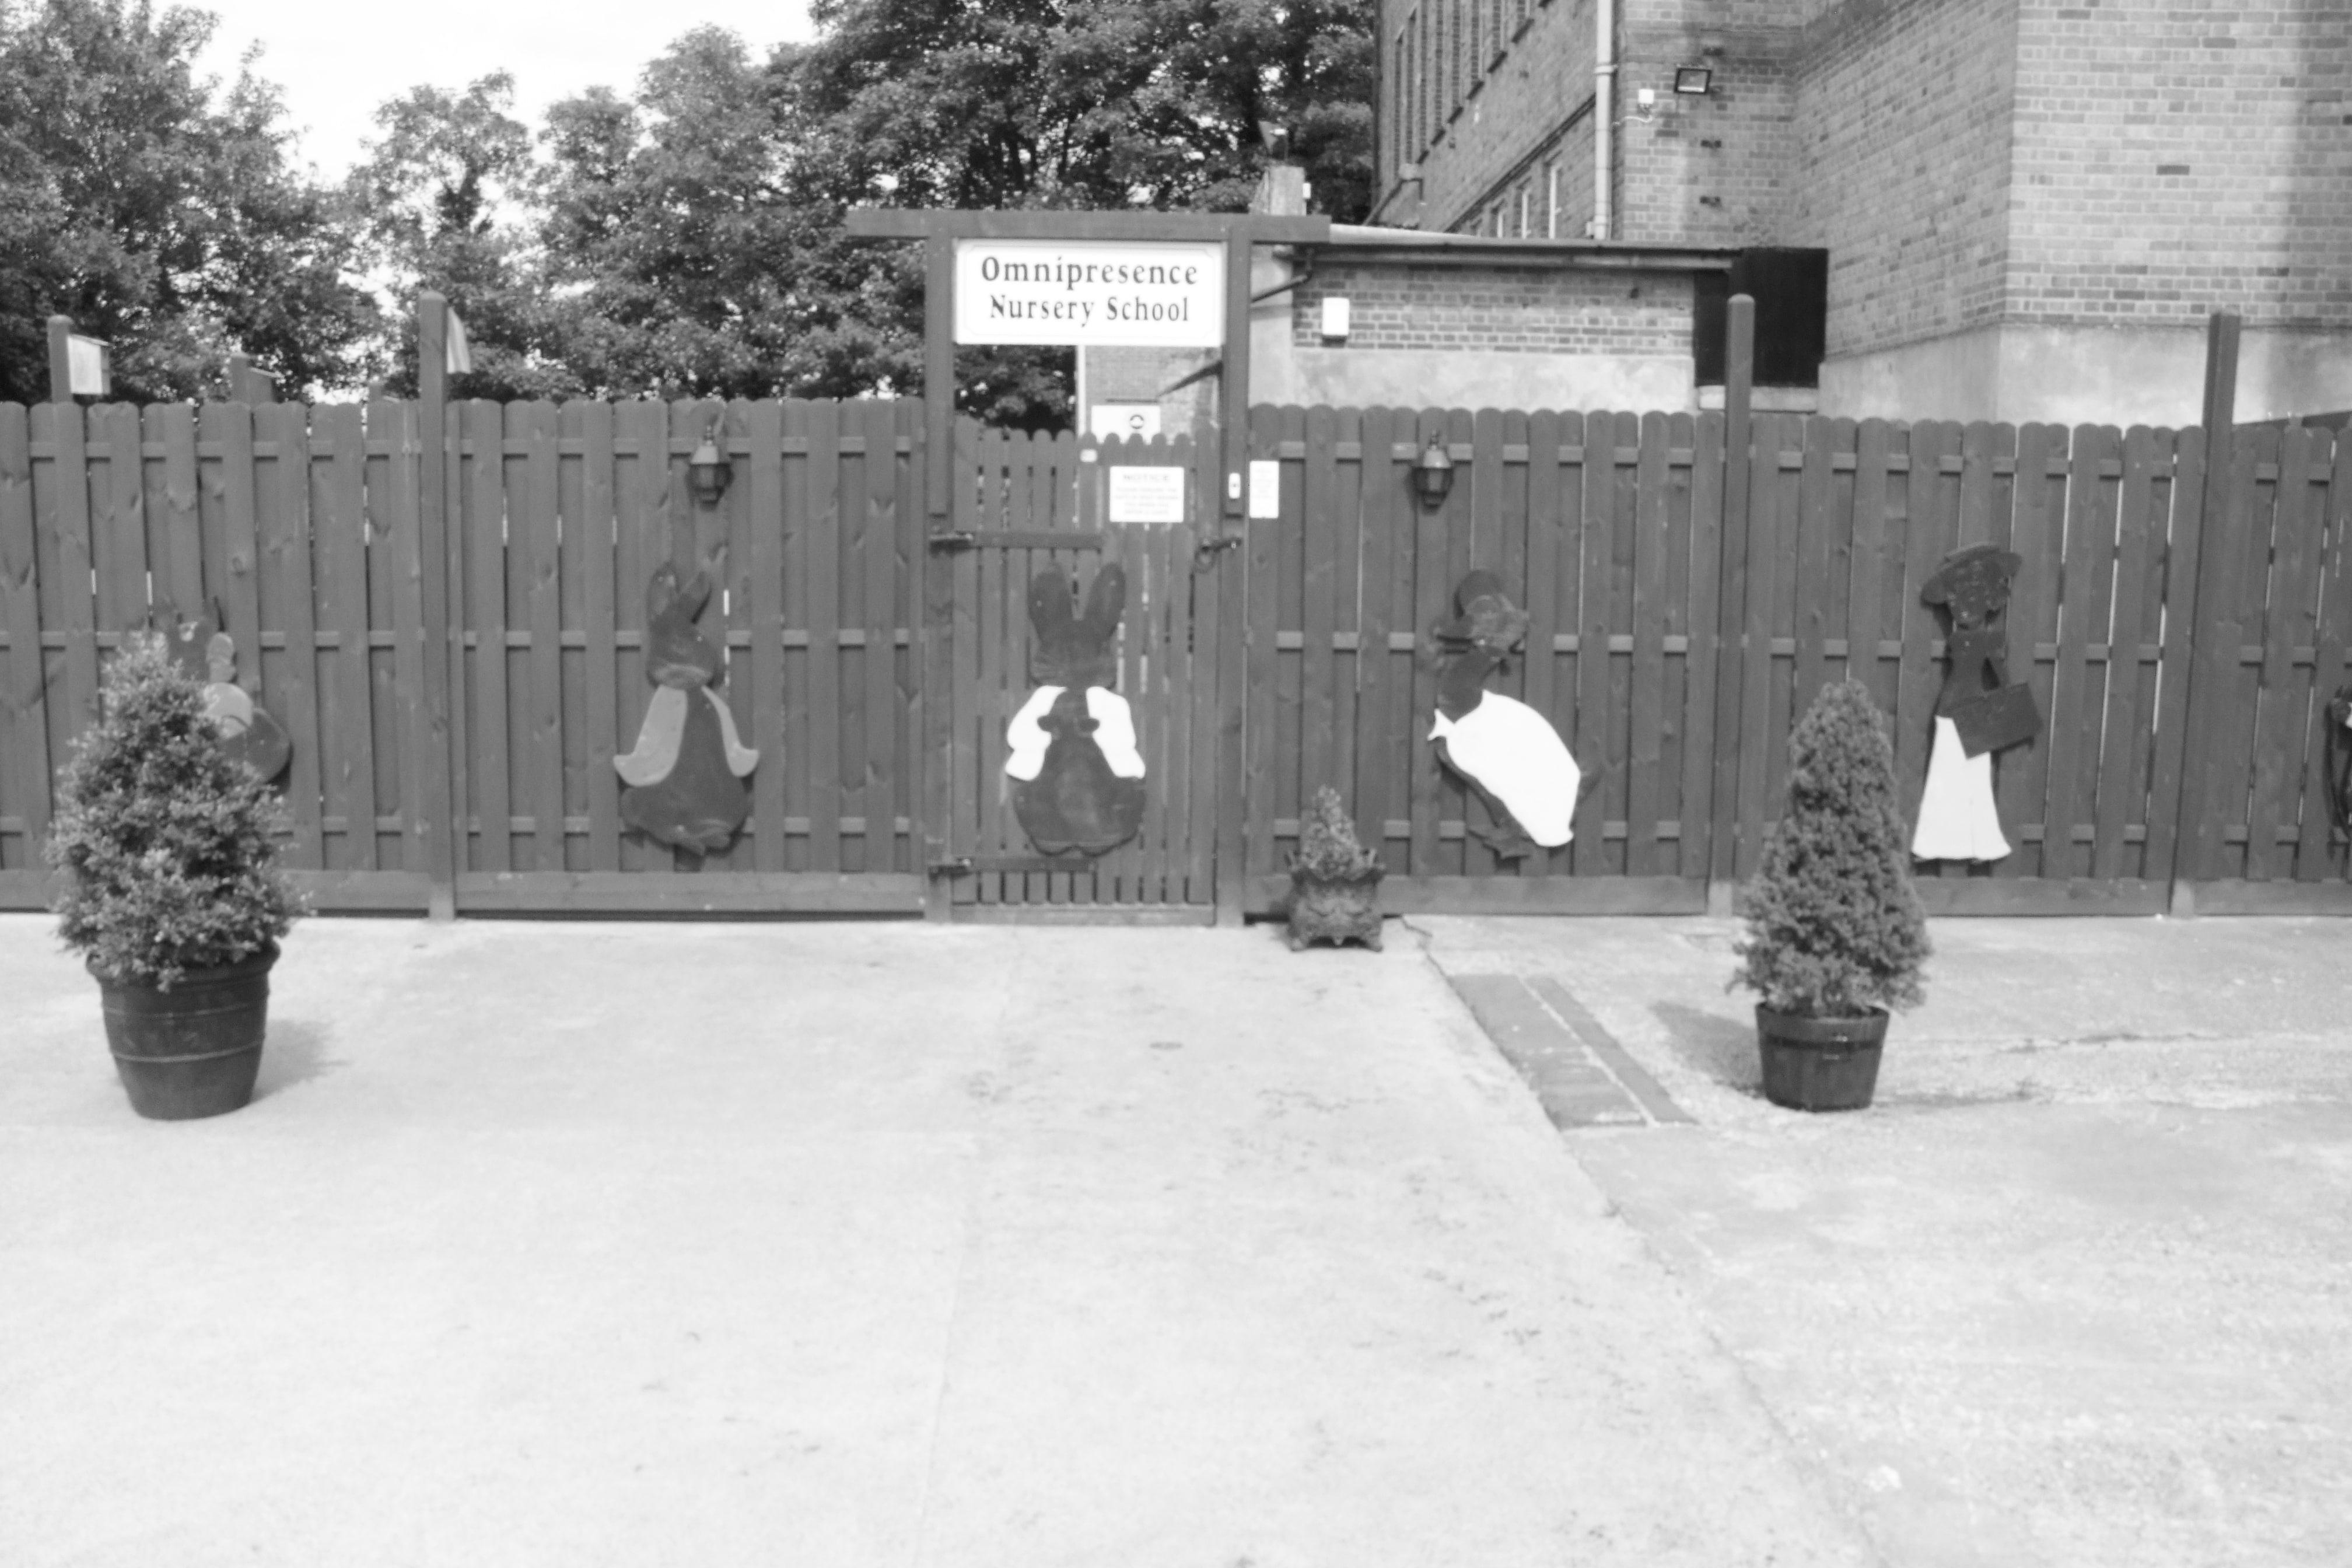 The Beginning - Omnipresence Nursery Northampton